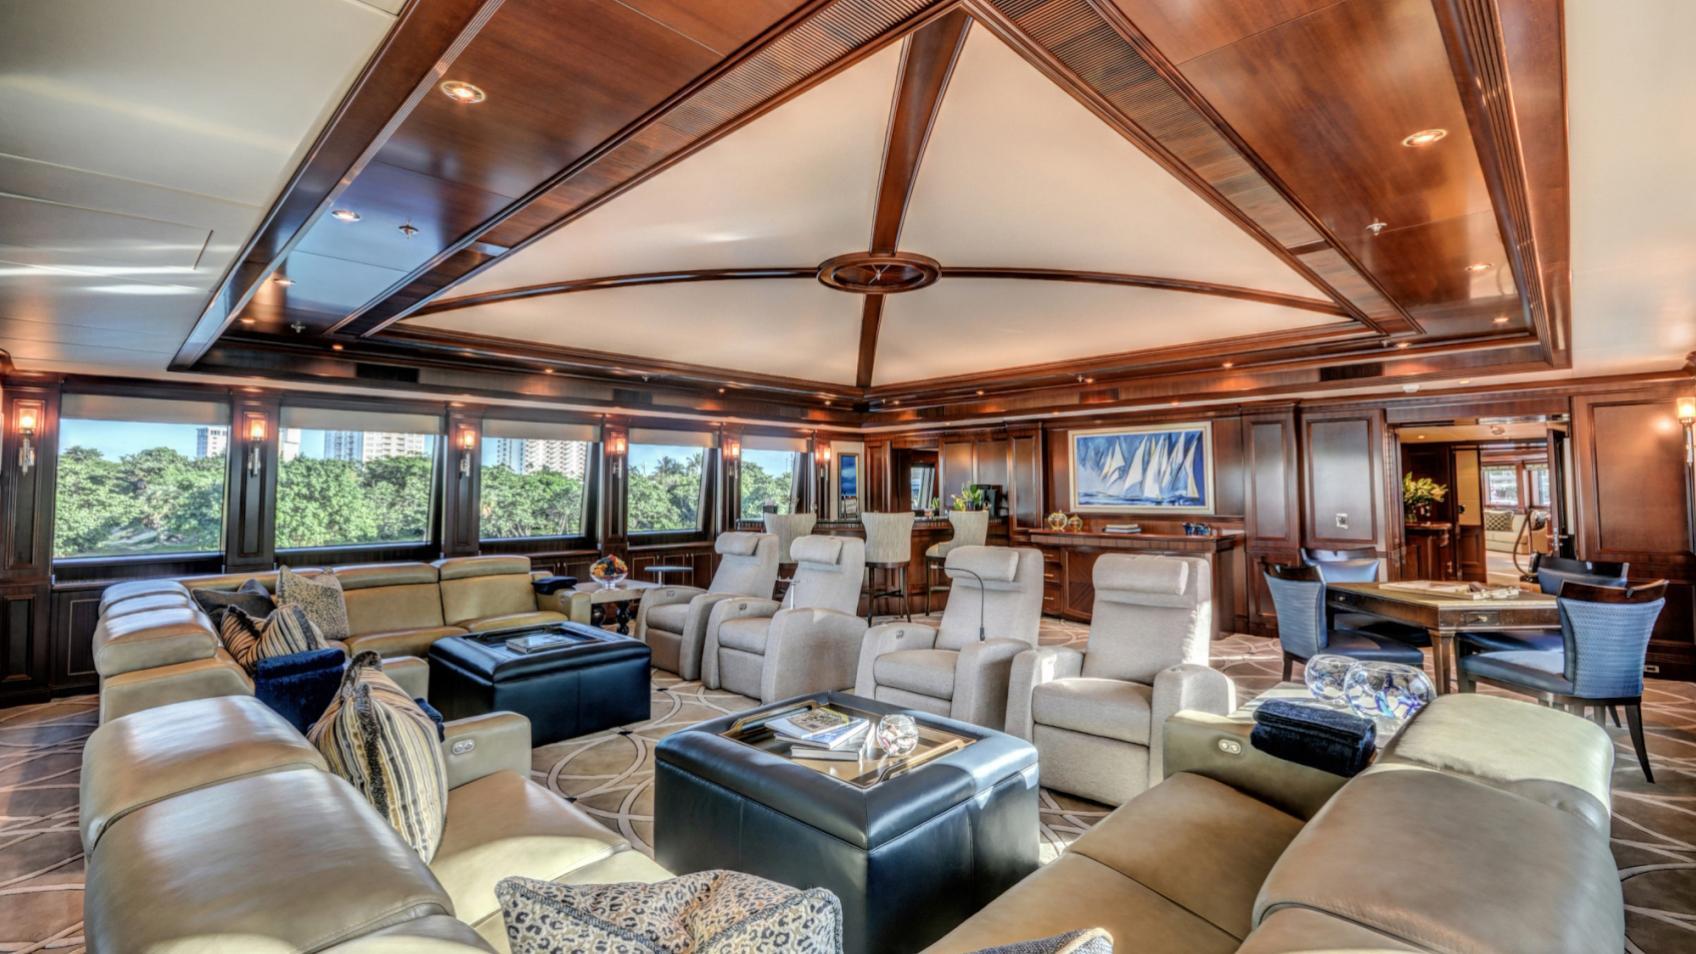 soverign motor yacht for sale lounge